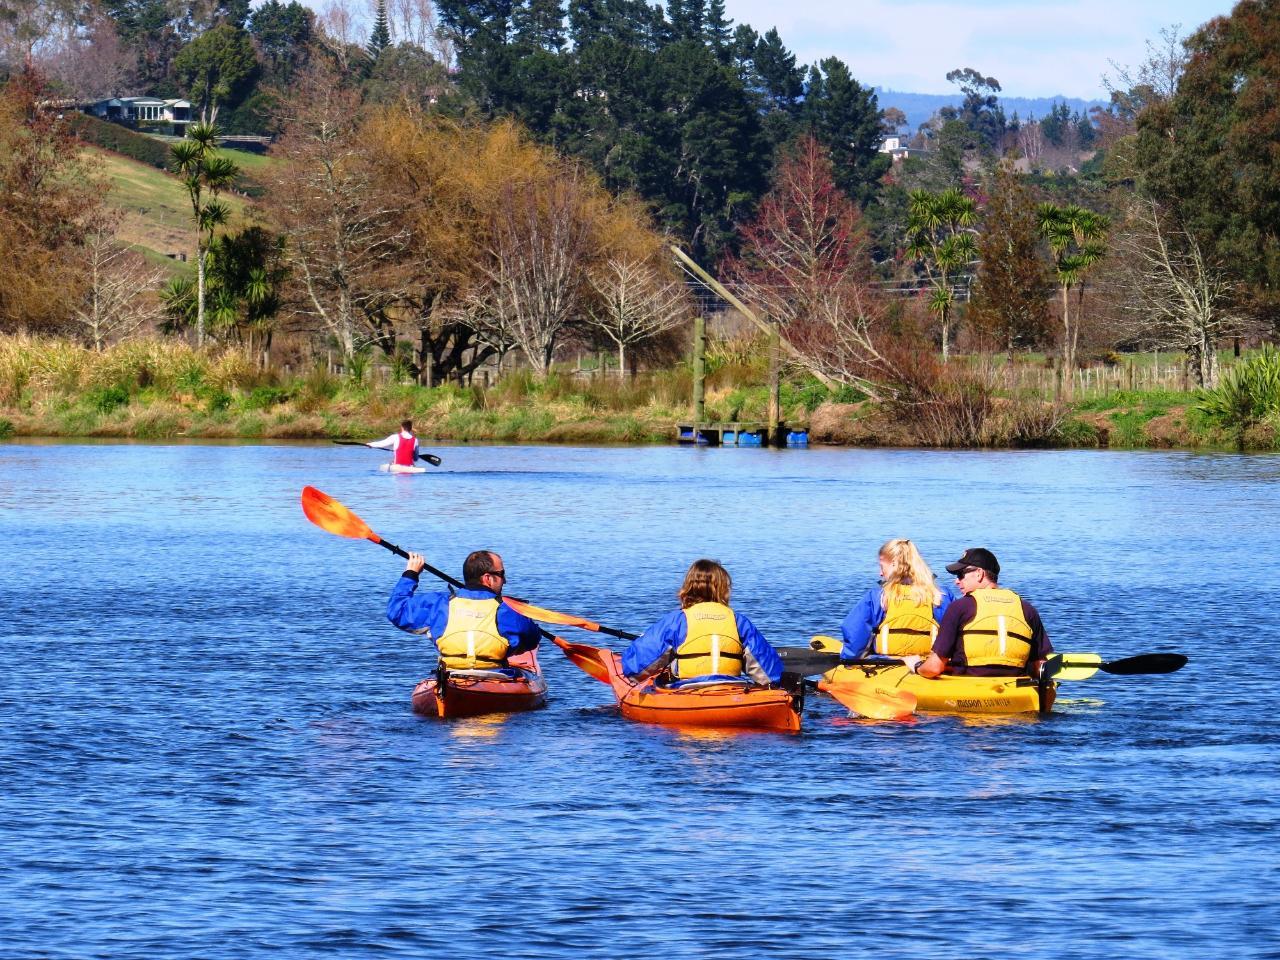 SHORE EXCURSION: Wairoa River Kayak Tour - Guided